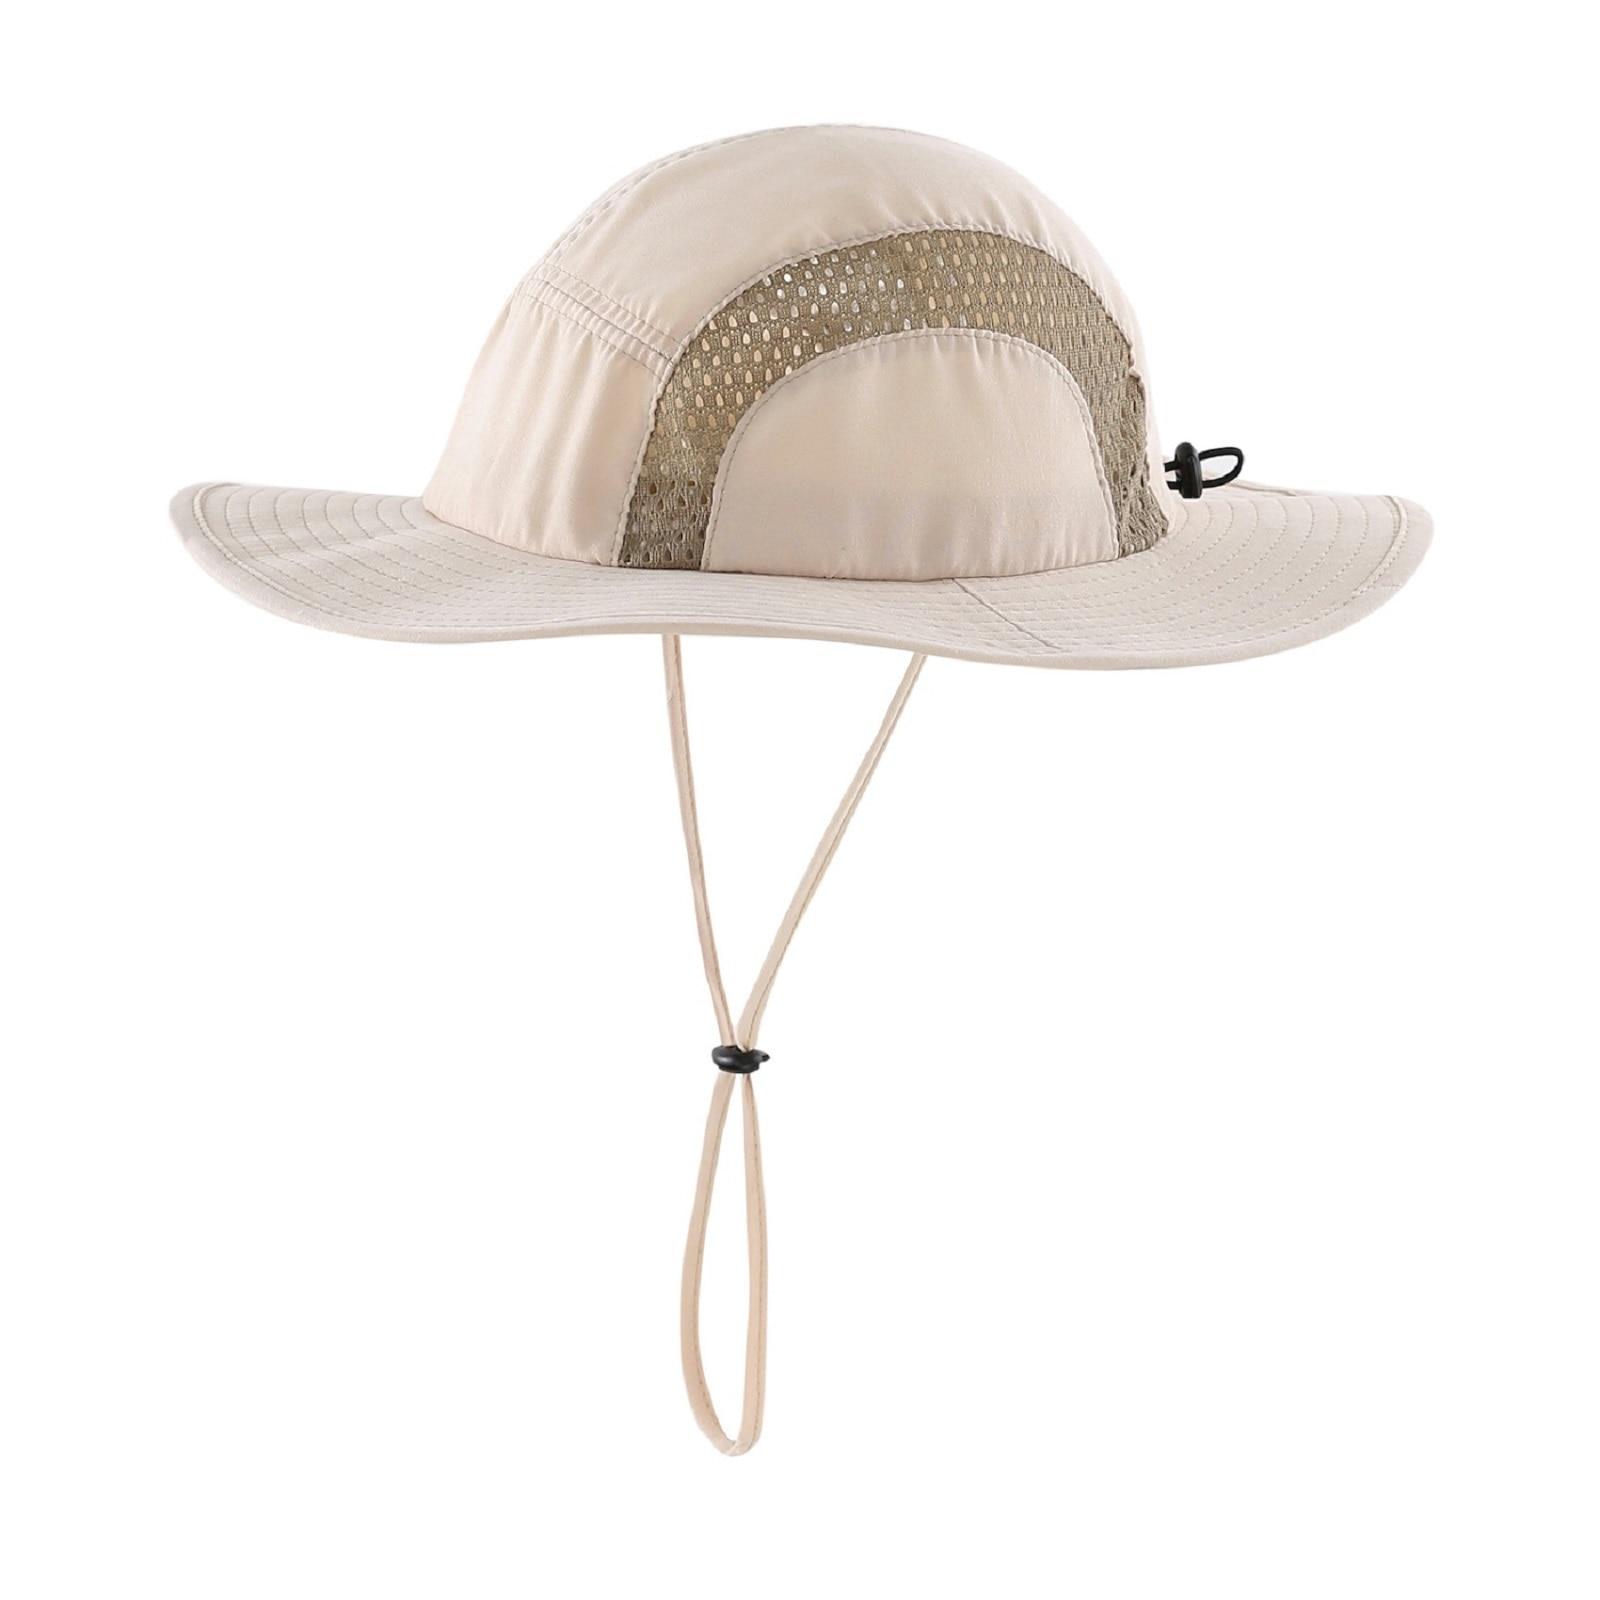 Home Prefer Kids UPF50 Safari Sun Hat Breathable Bucket Hat Summer Play Hat